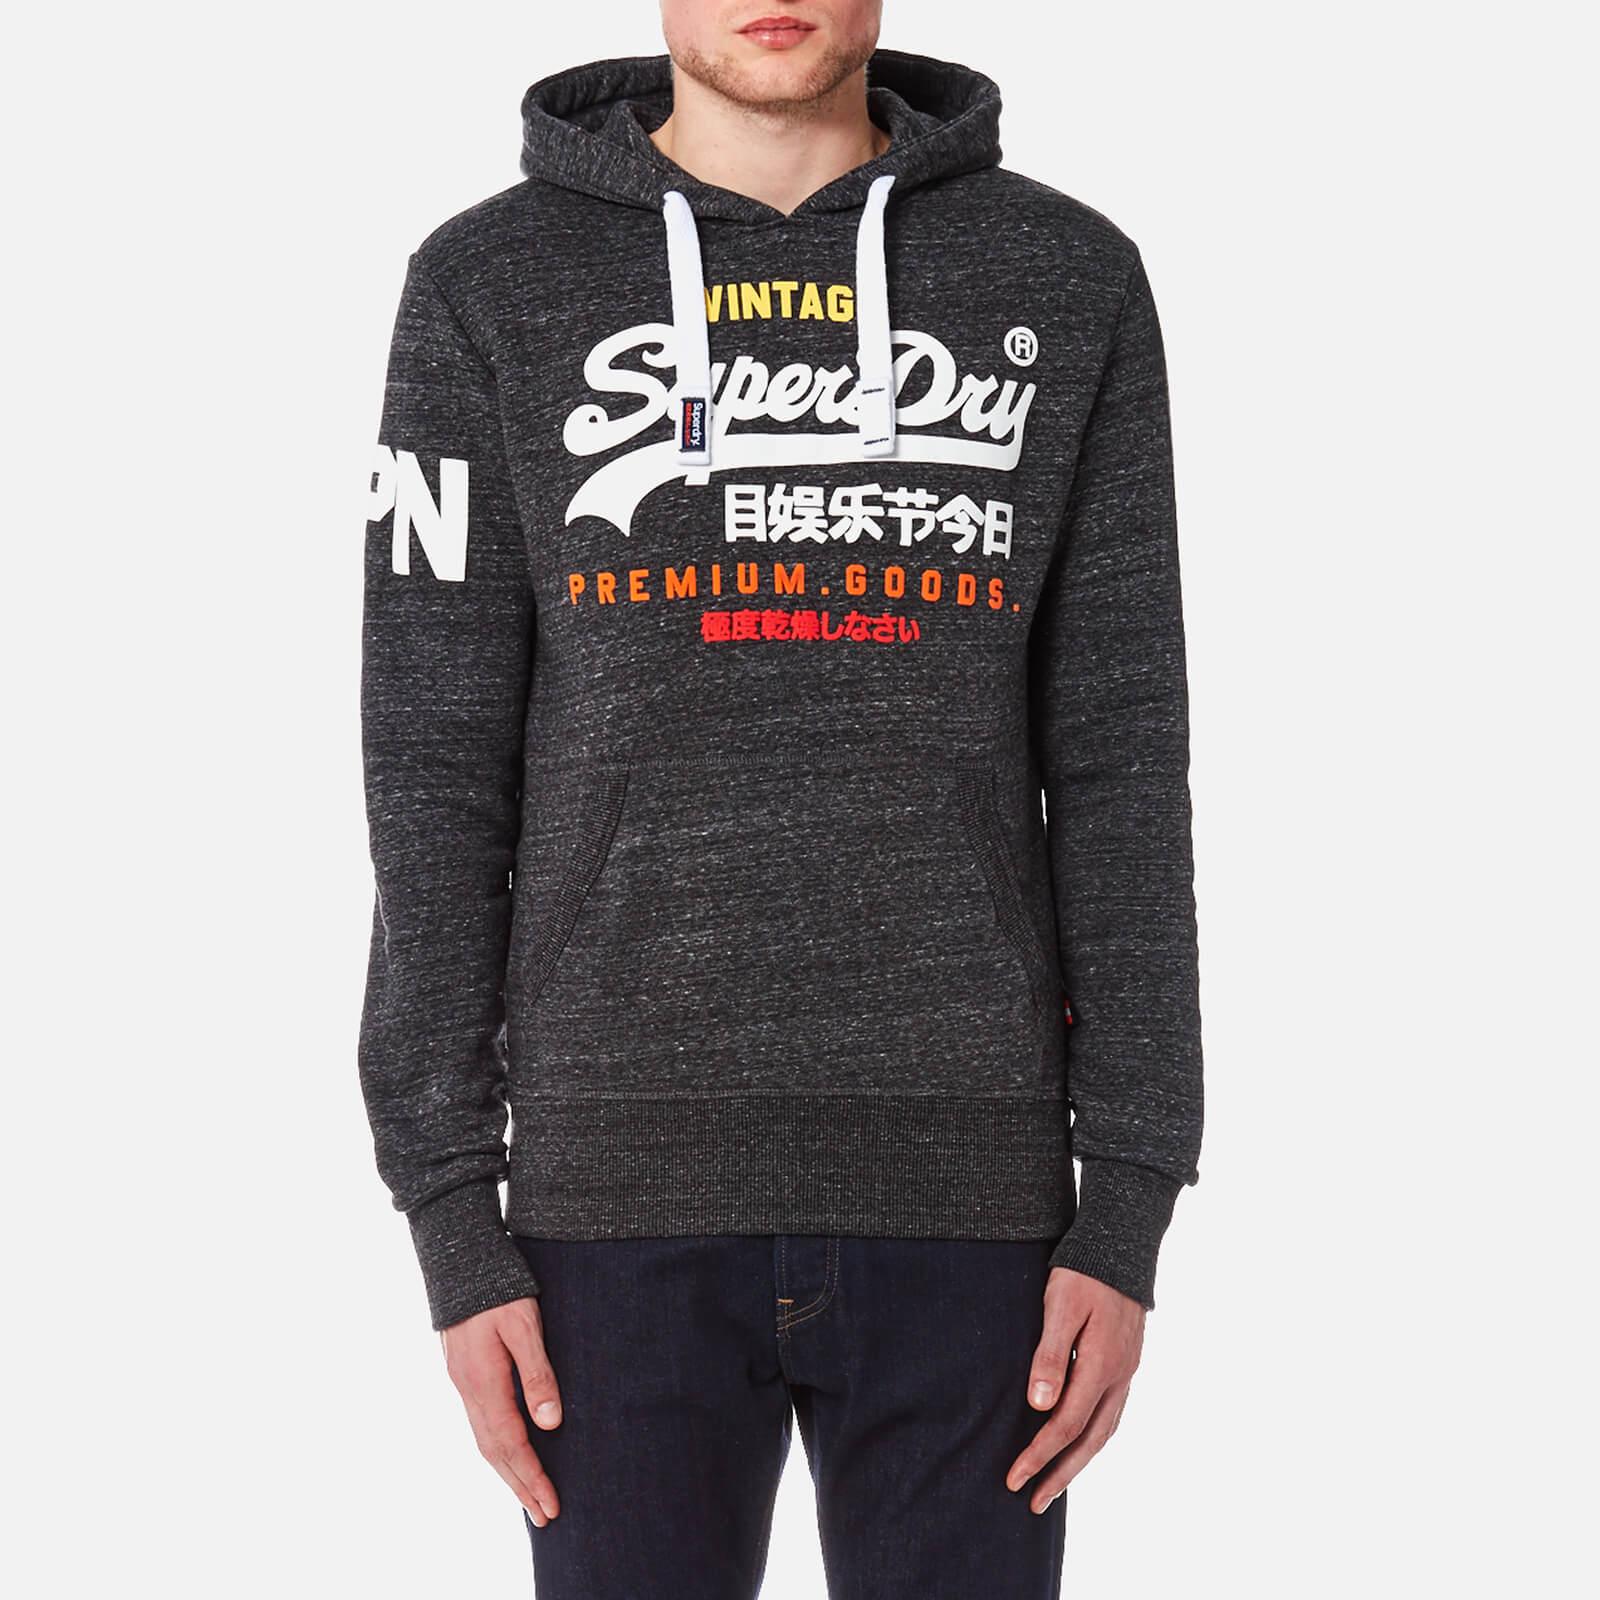 timeless design f252f f4ca6 Superdry Men's Premium Goods Tri Hoody - Asphalt Snowy